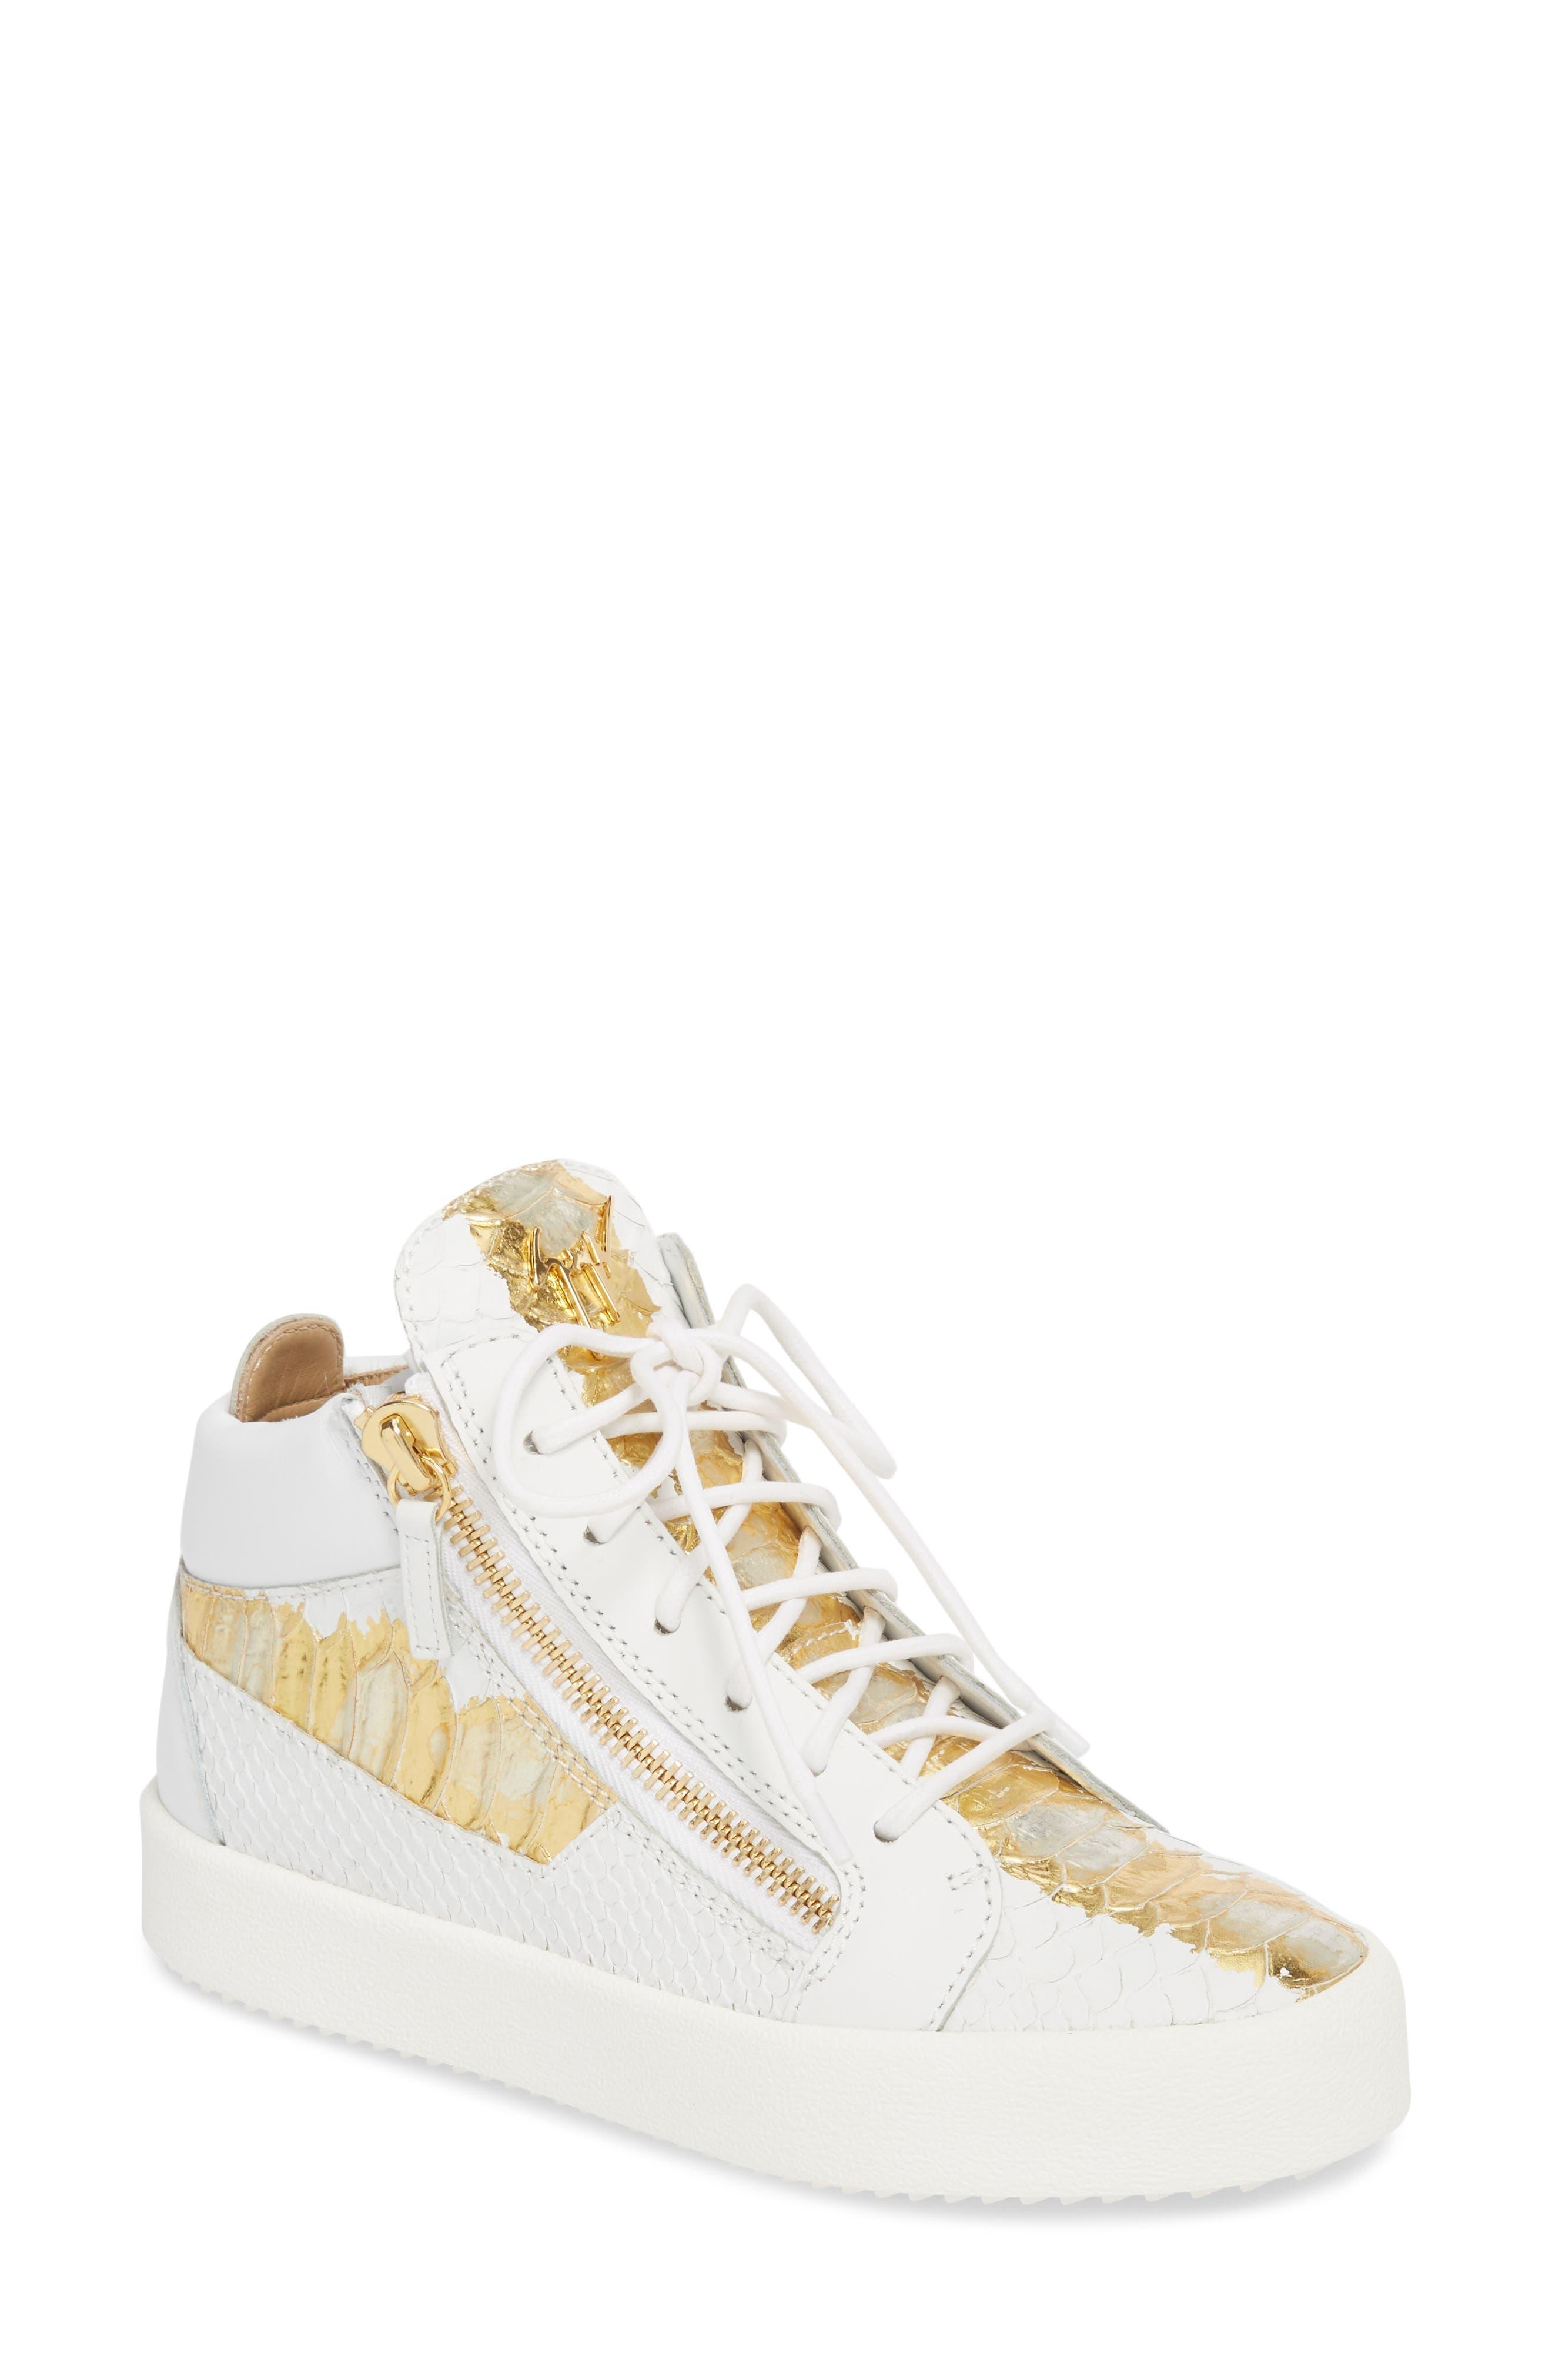 GIUSEPPE ZANOTTI, May London Mid Top Sneaker, Main thumbnail 1, color, WHITE/NEON YELLOW